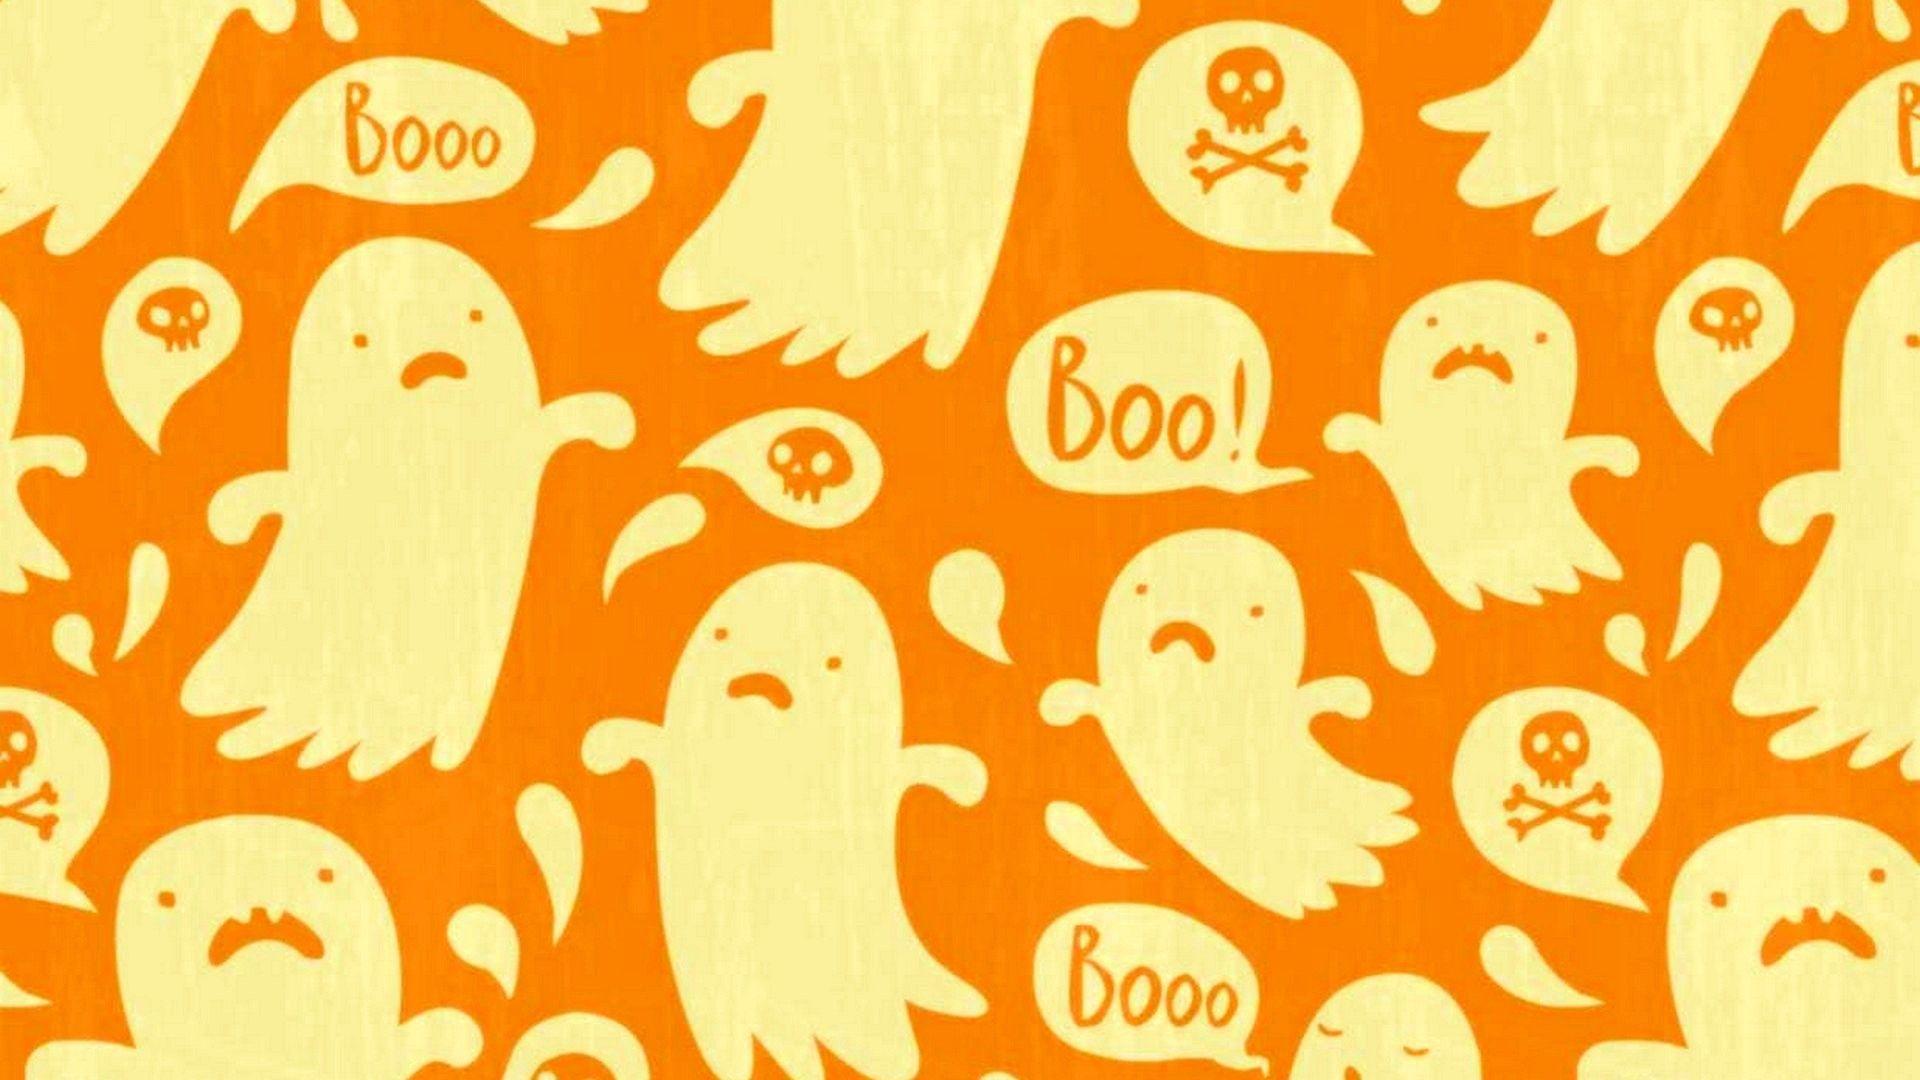 Halloween Aesthetic Wallpaper Hd 2021 Live Wallpaper Hd Halloween Wallpaper Iphone Cute Laptop Wallpaper Iphone Background Wallpaper